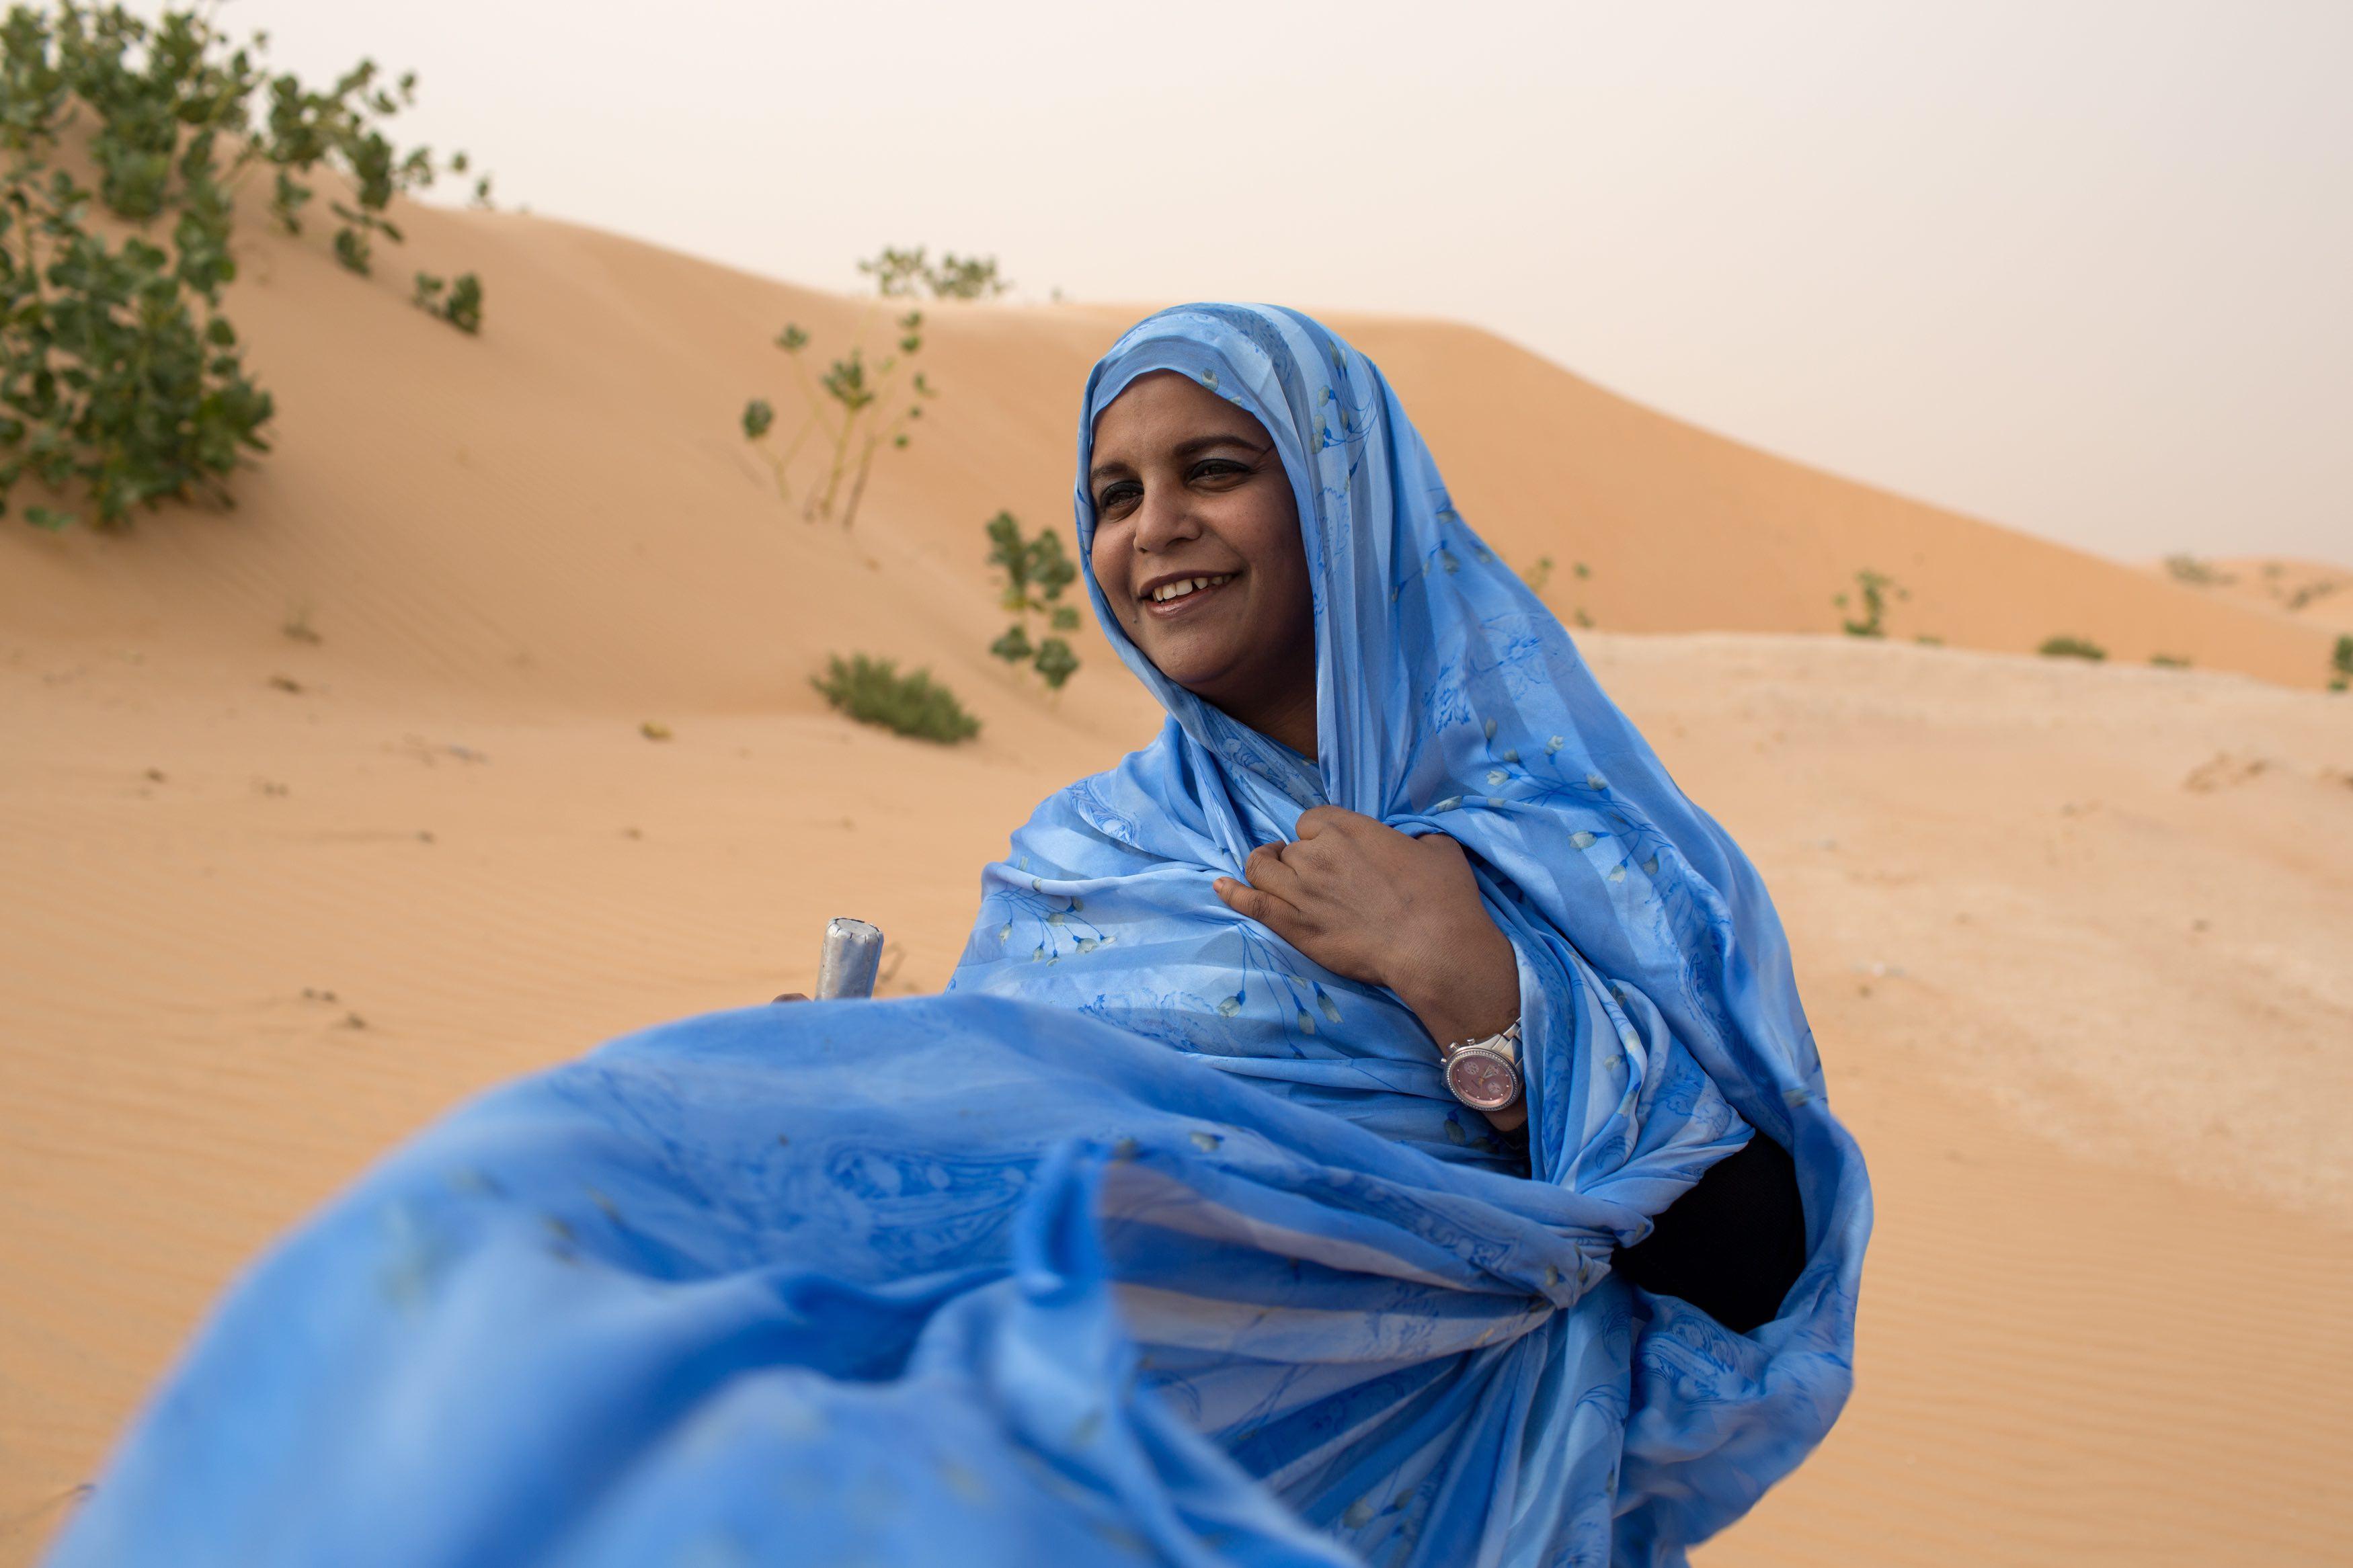 La mauritana Noura Mint Seymali, nuevo nombre en sumarse al Festival Boreal 2017